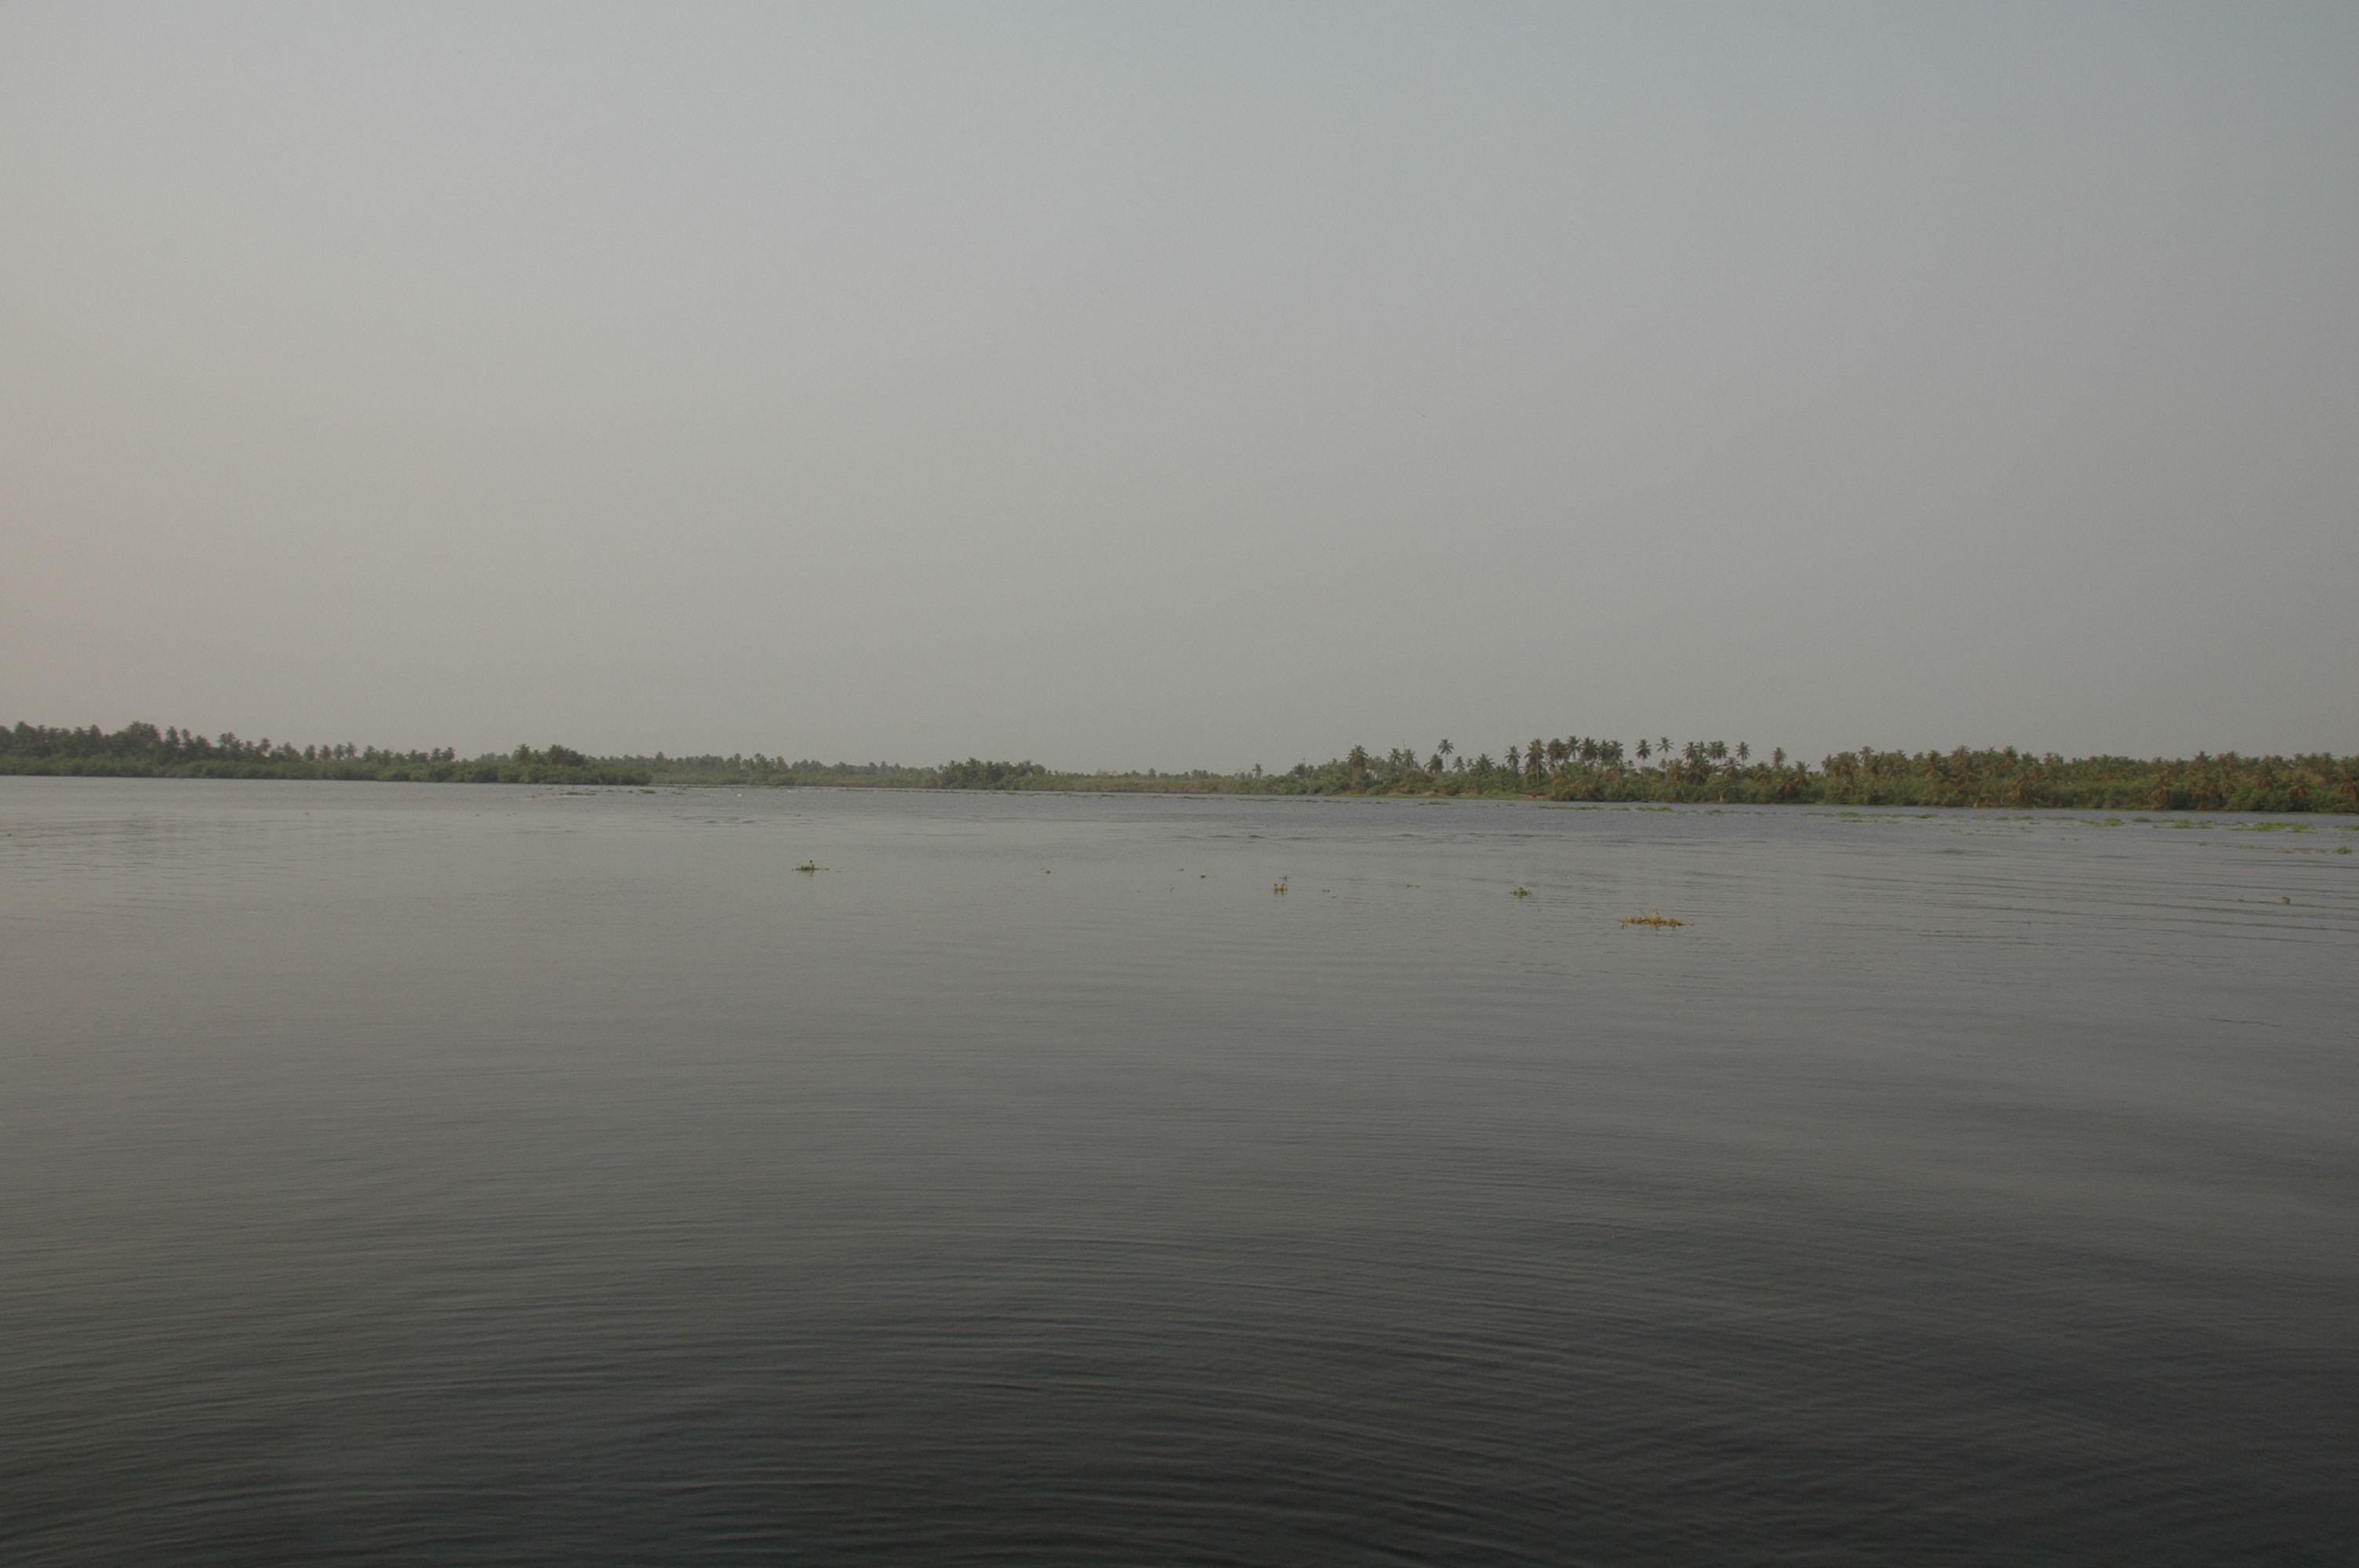 Dsc Nigerian Coastline Length